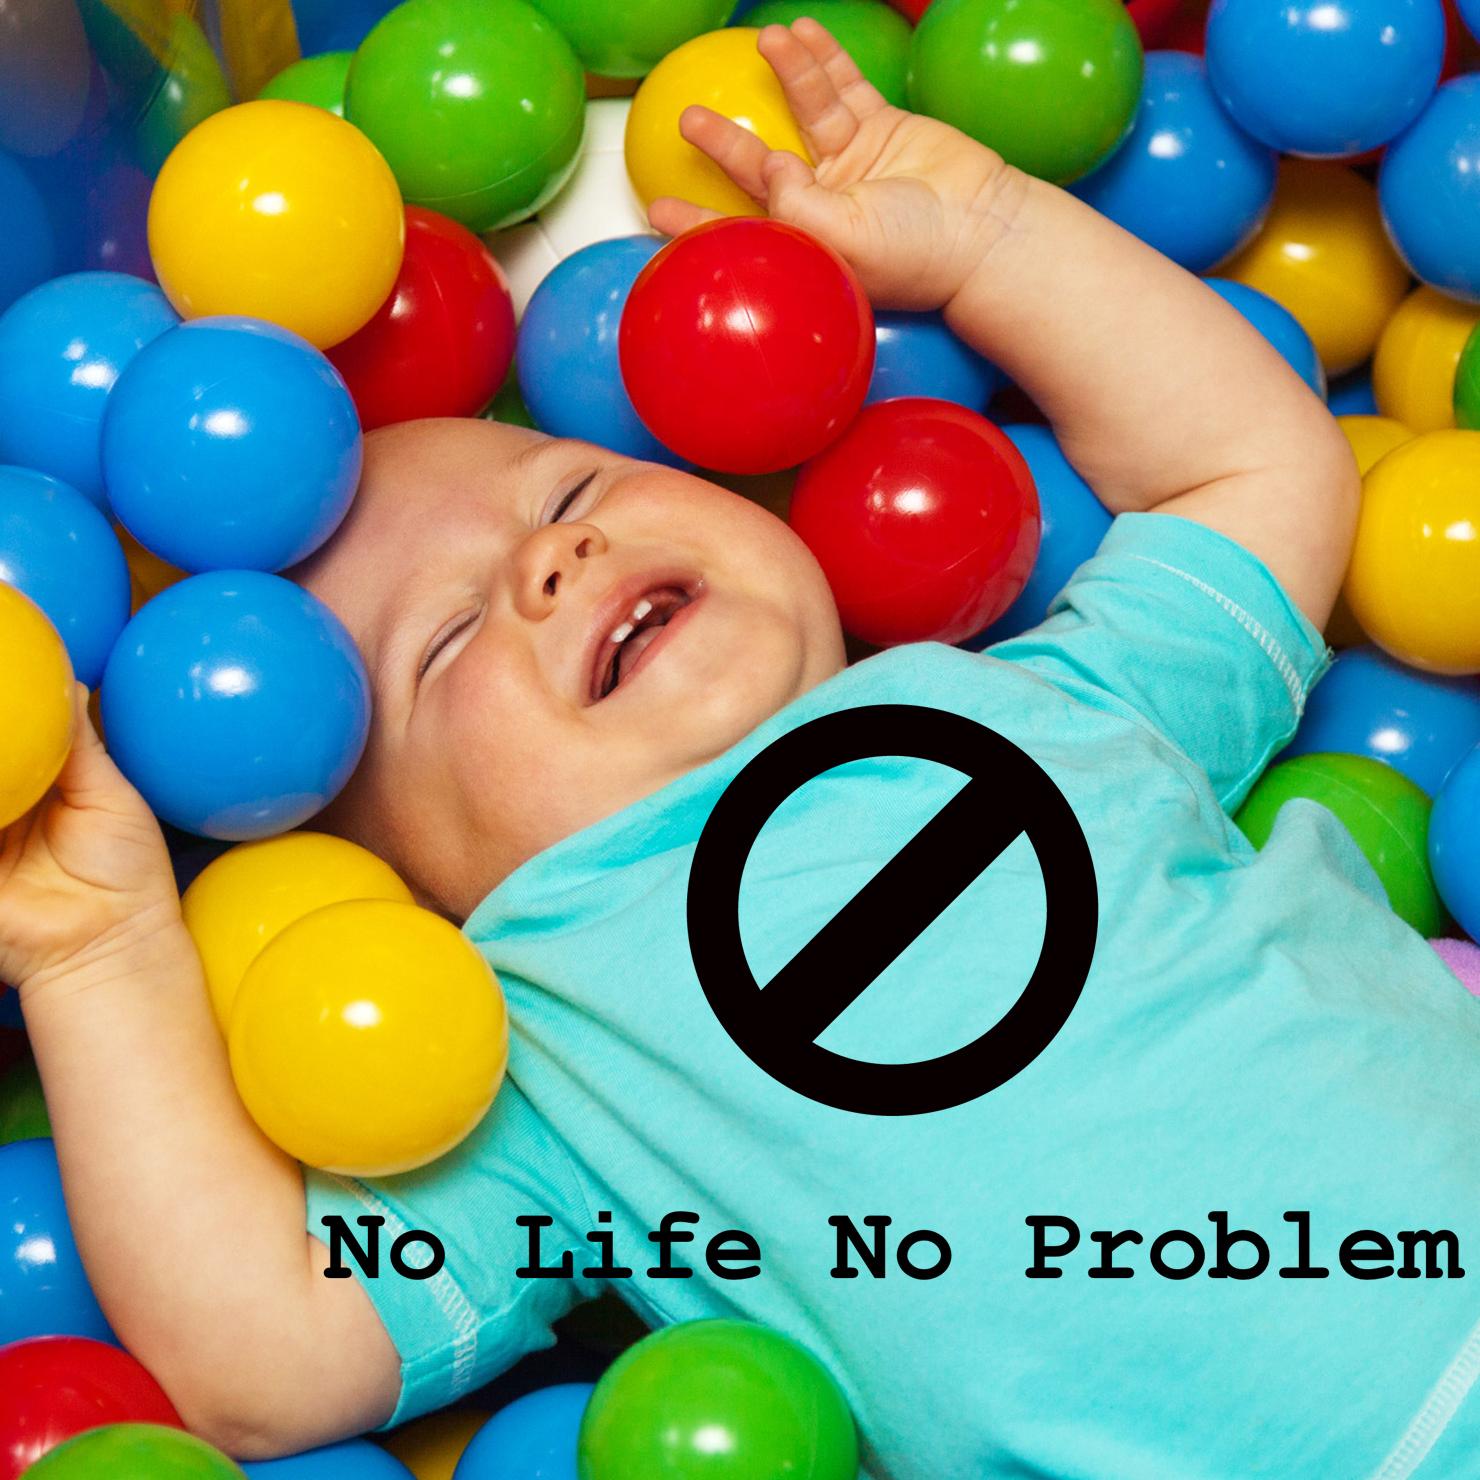 No Life No Problem